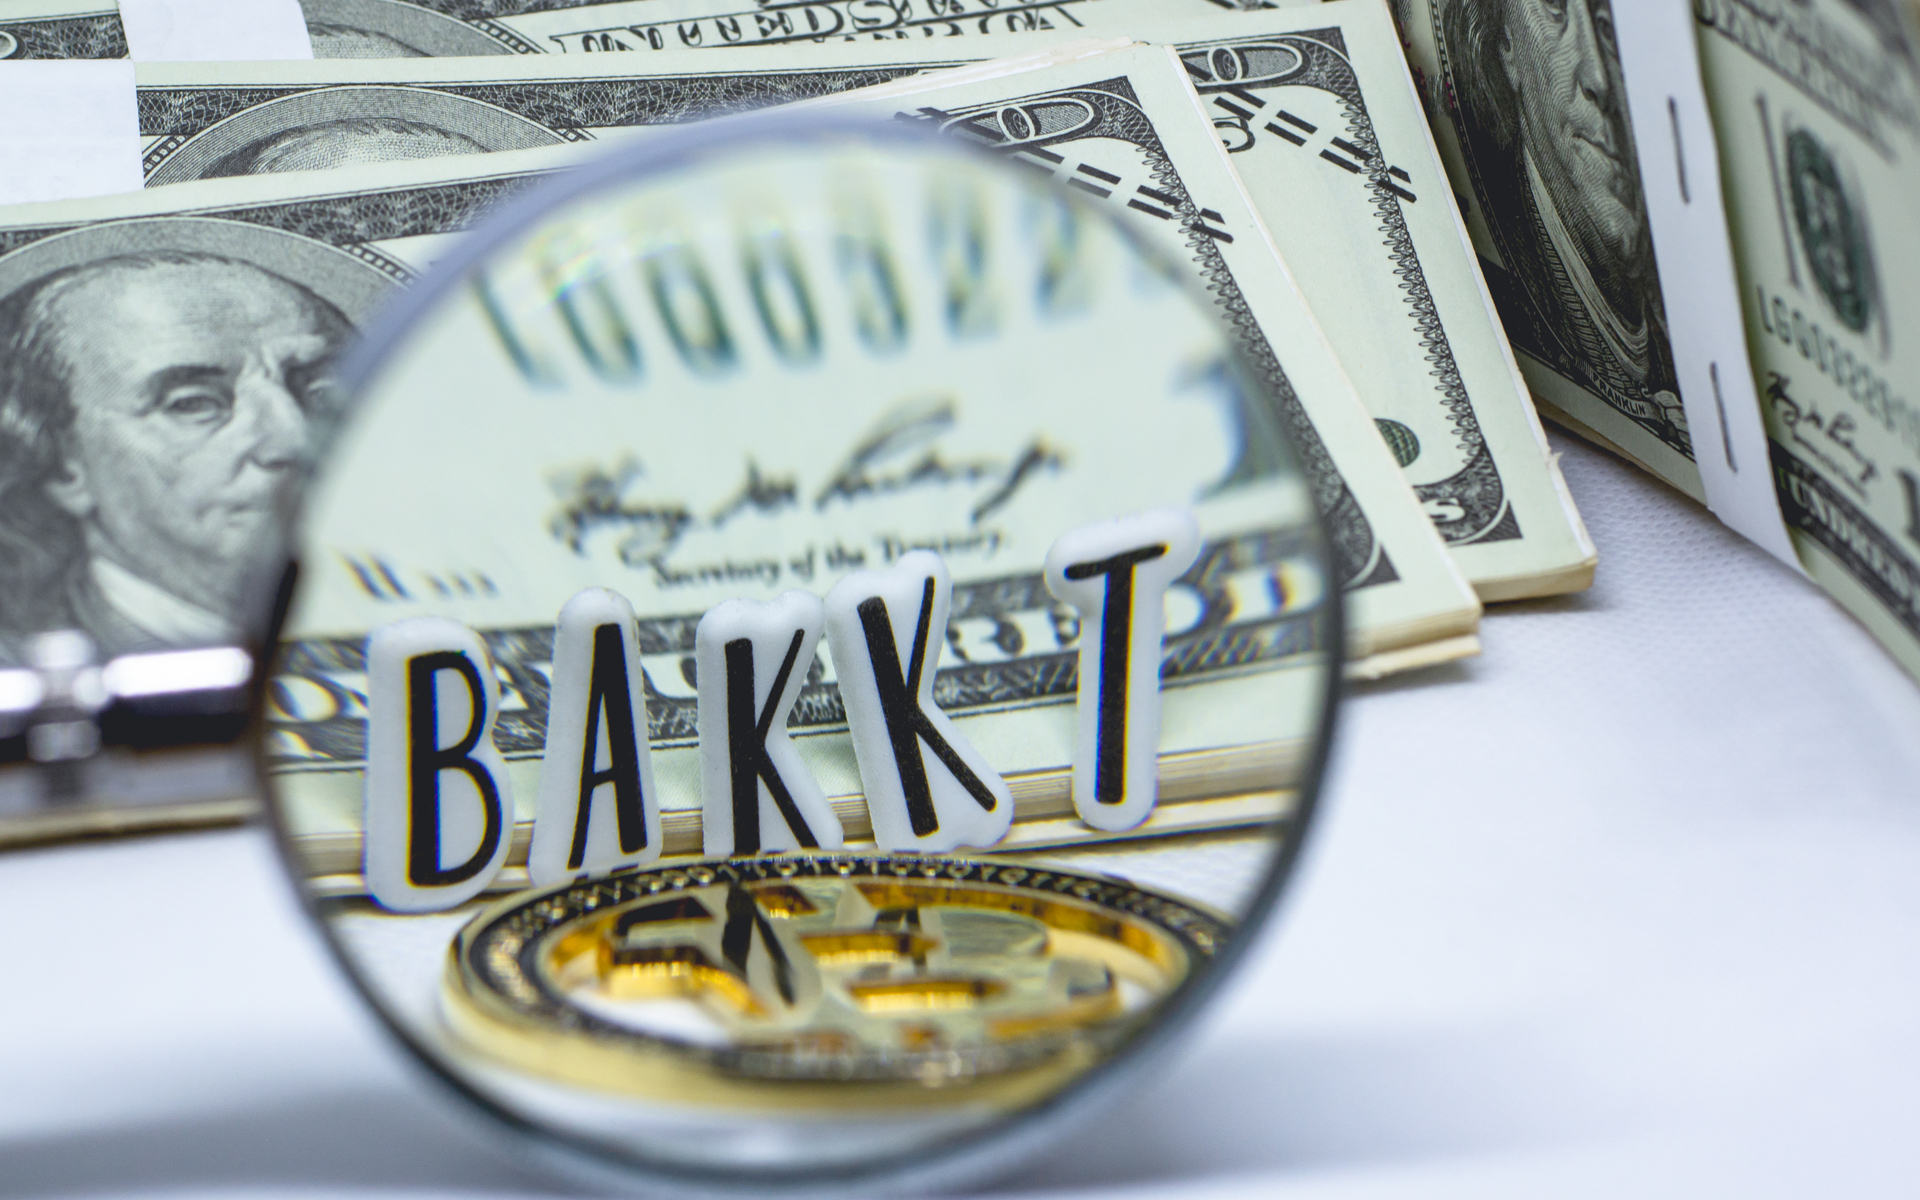 bakkt bitcoin futures new record